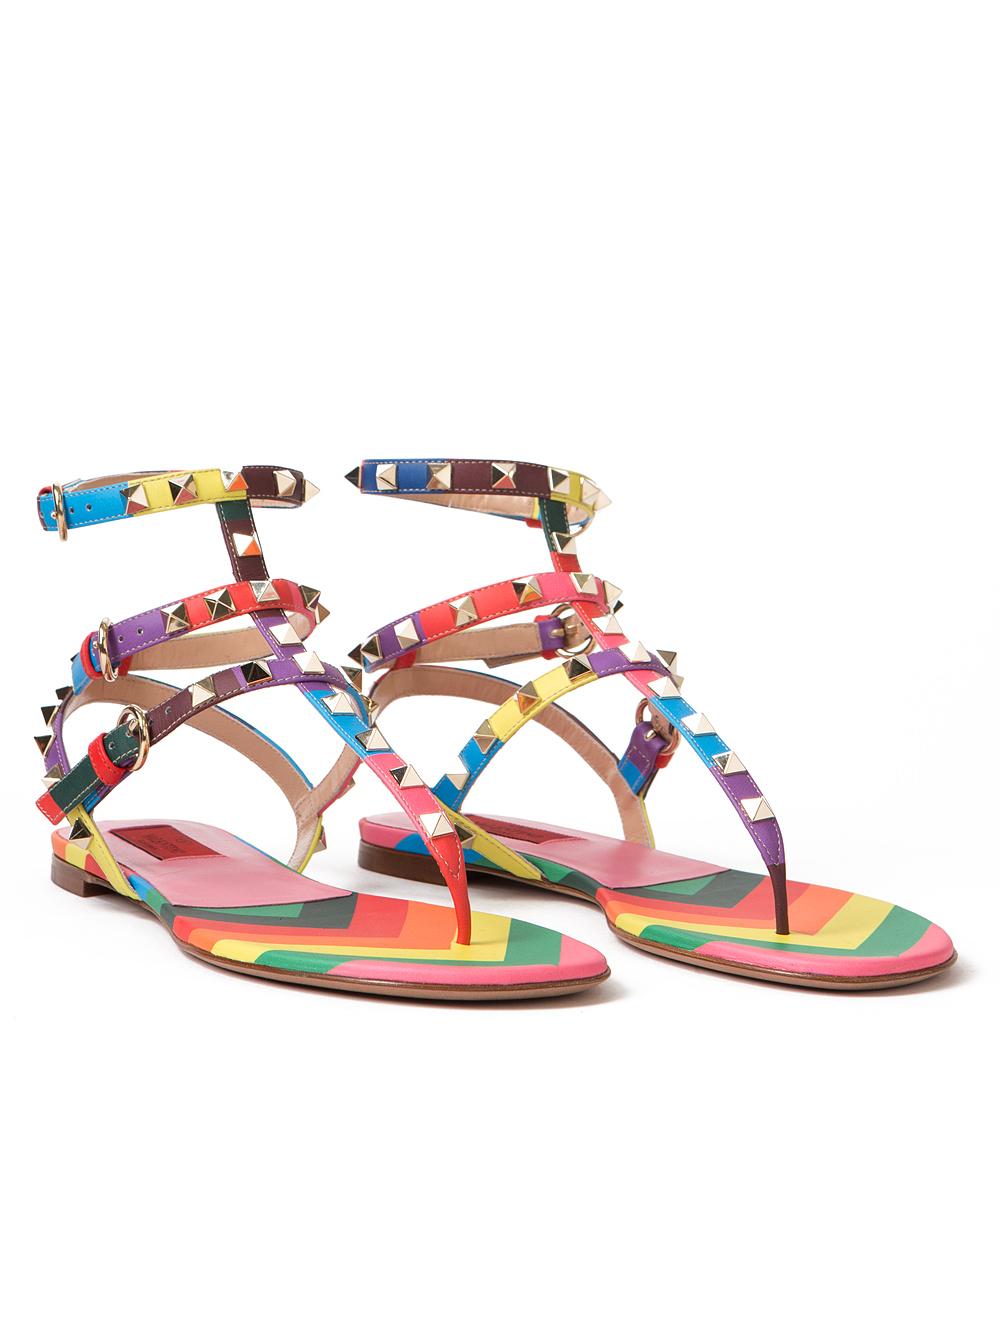 69435920b2f6 Lyst - Valentino Rainbow Rockstud Gladiator Sandals